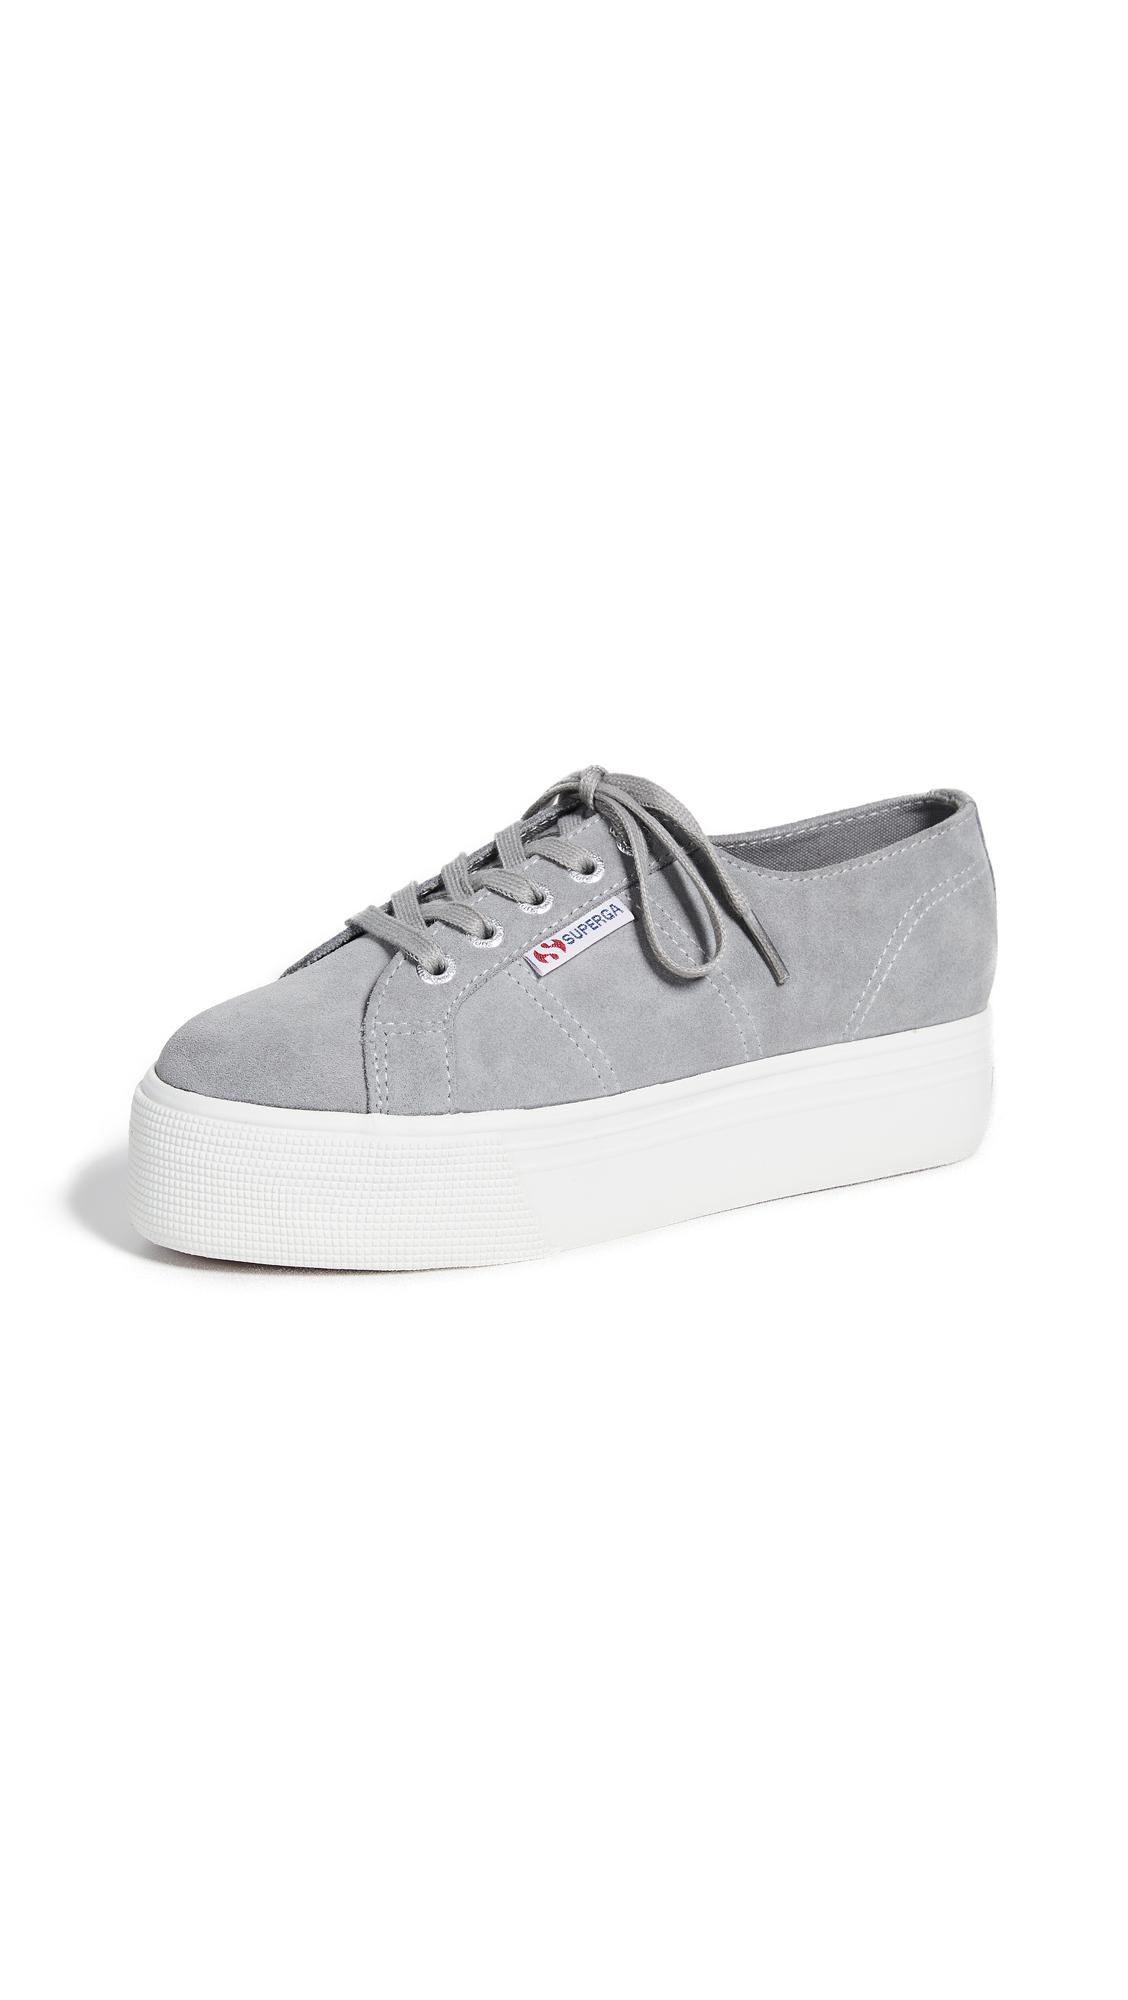 Superga 2790 Platform Classic Sneakers